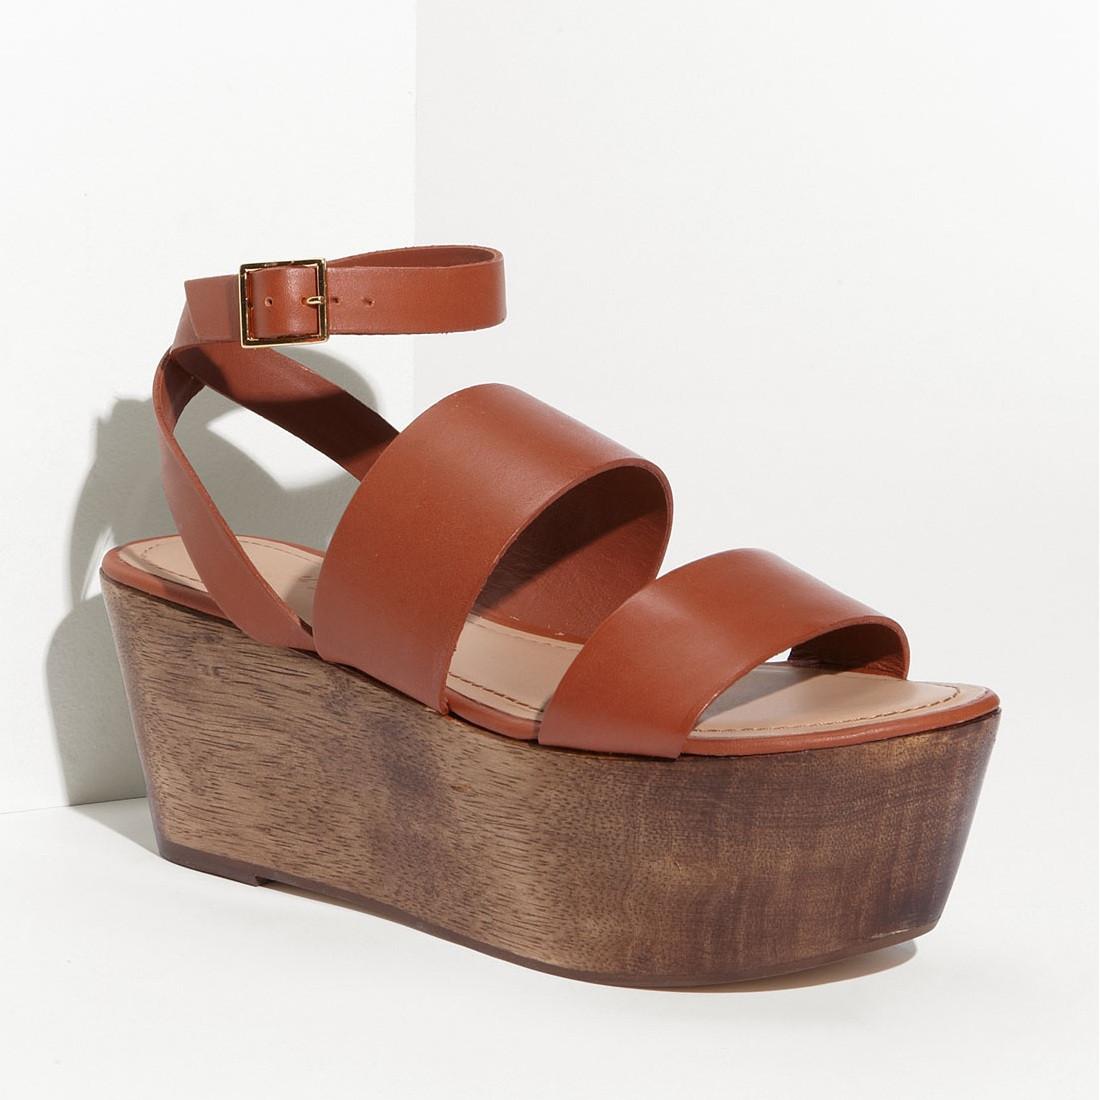 a04e747a1 Elizabeth and James Bax Platform Sandal. Price   265.00. Image 1